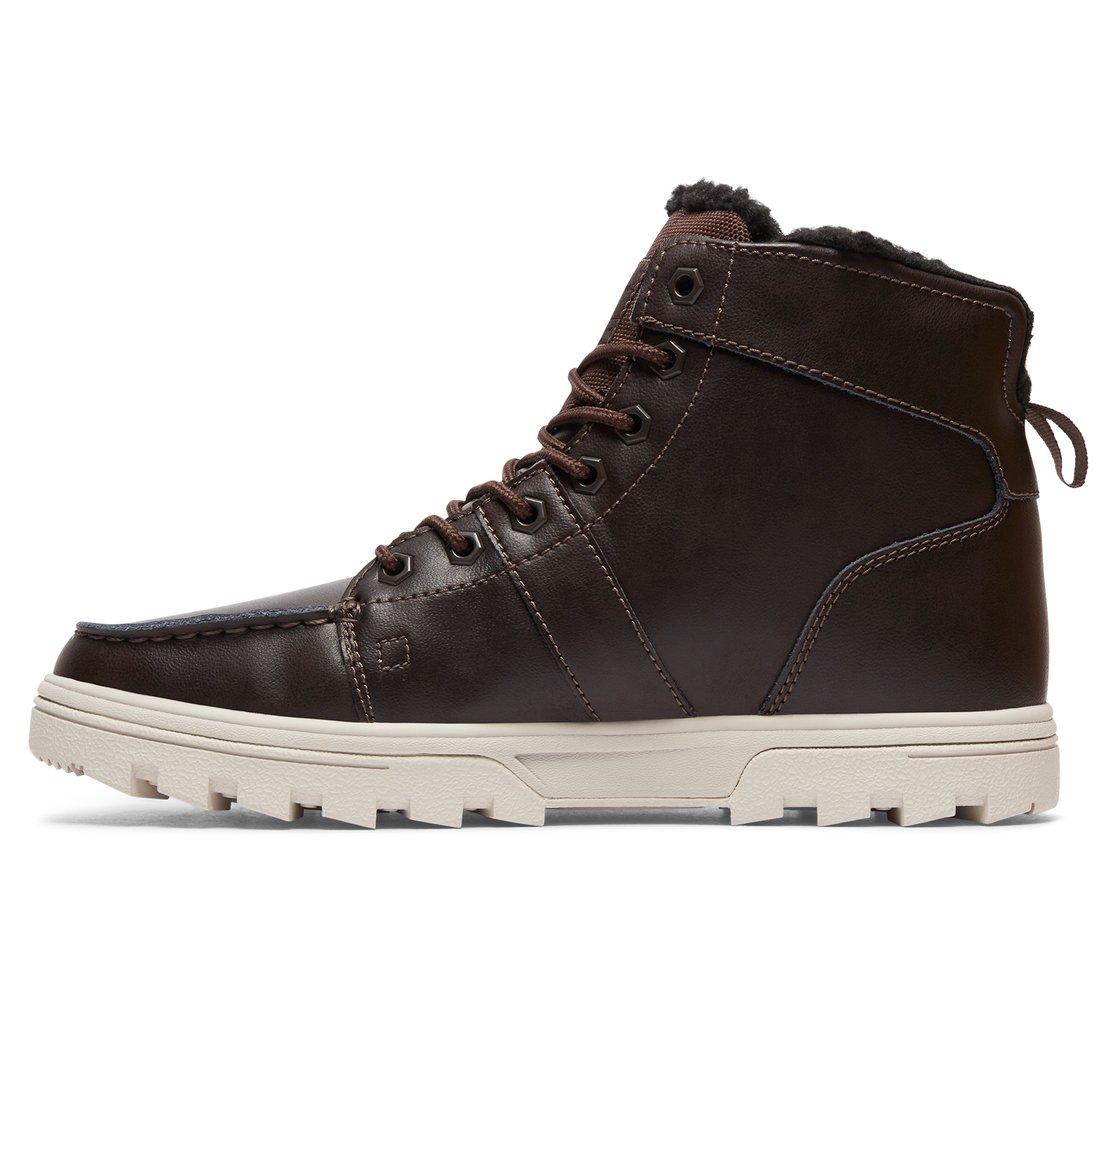 Wohnideen Wunderweib woodland outdoor winter boots 3613372847110 dc shoes